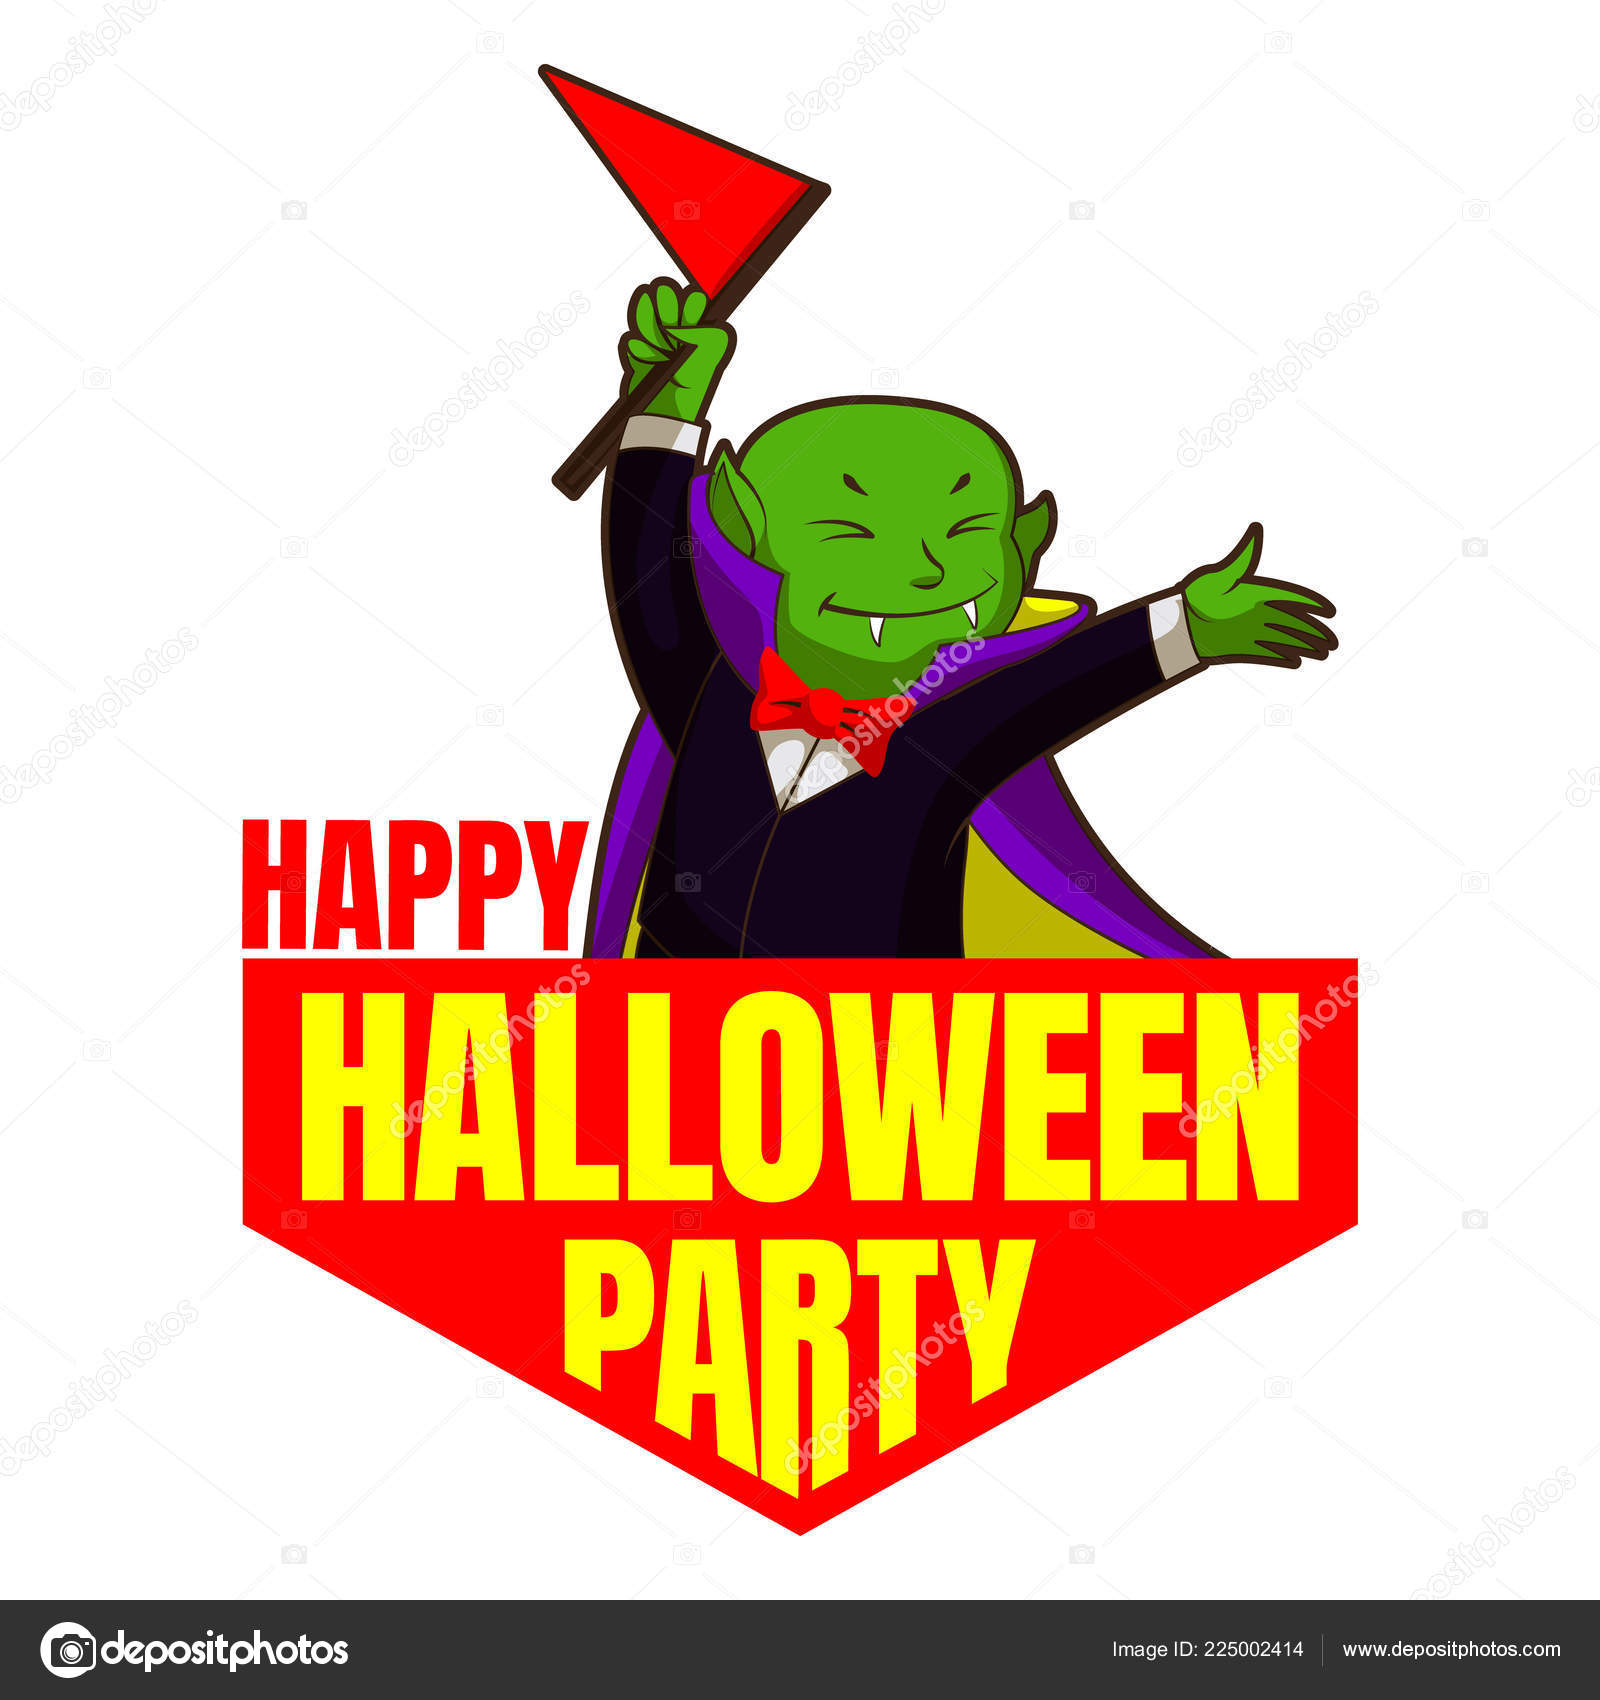 happy halloween party logo cartoon style stock vector anatolir